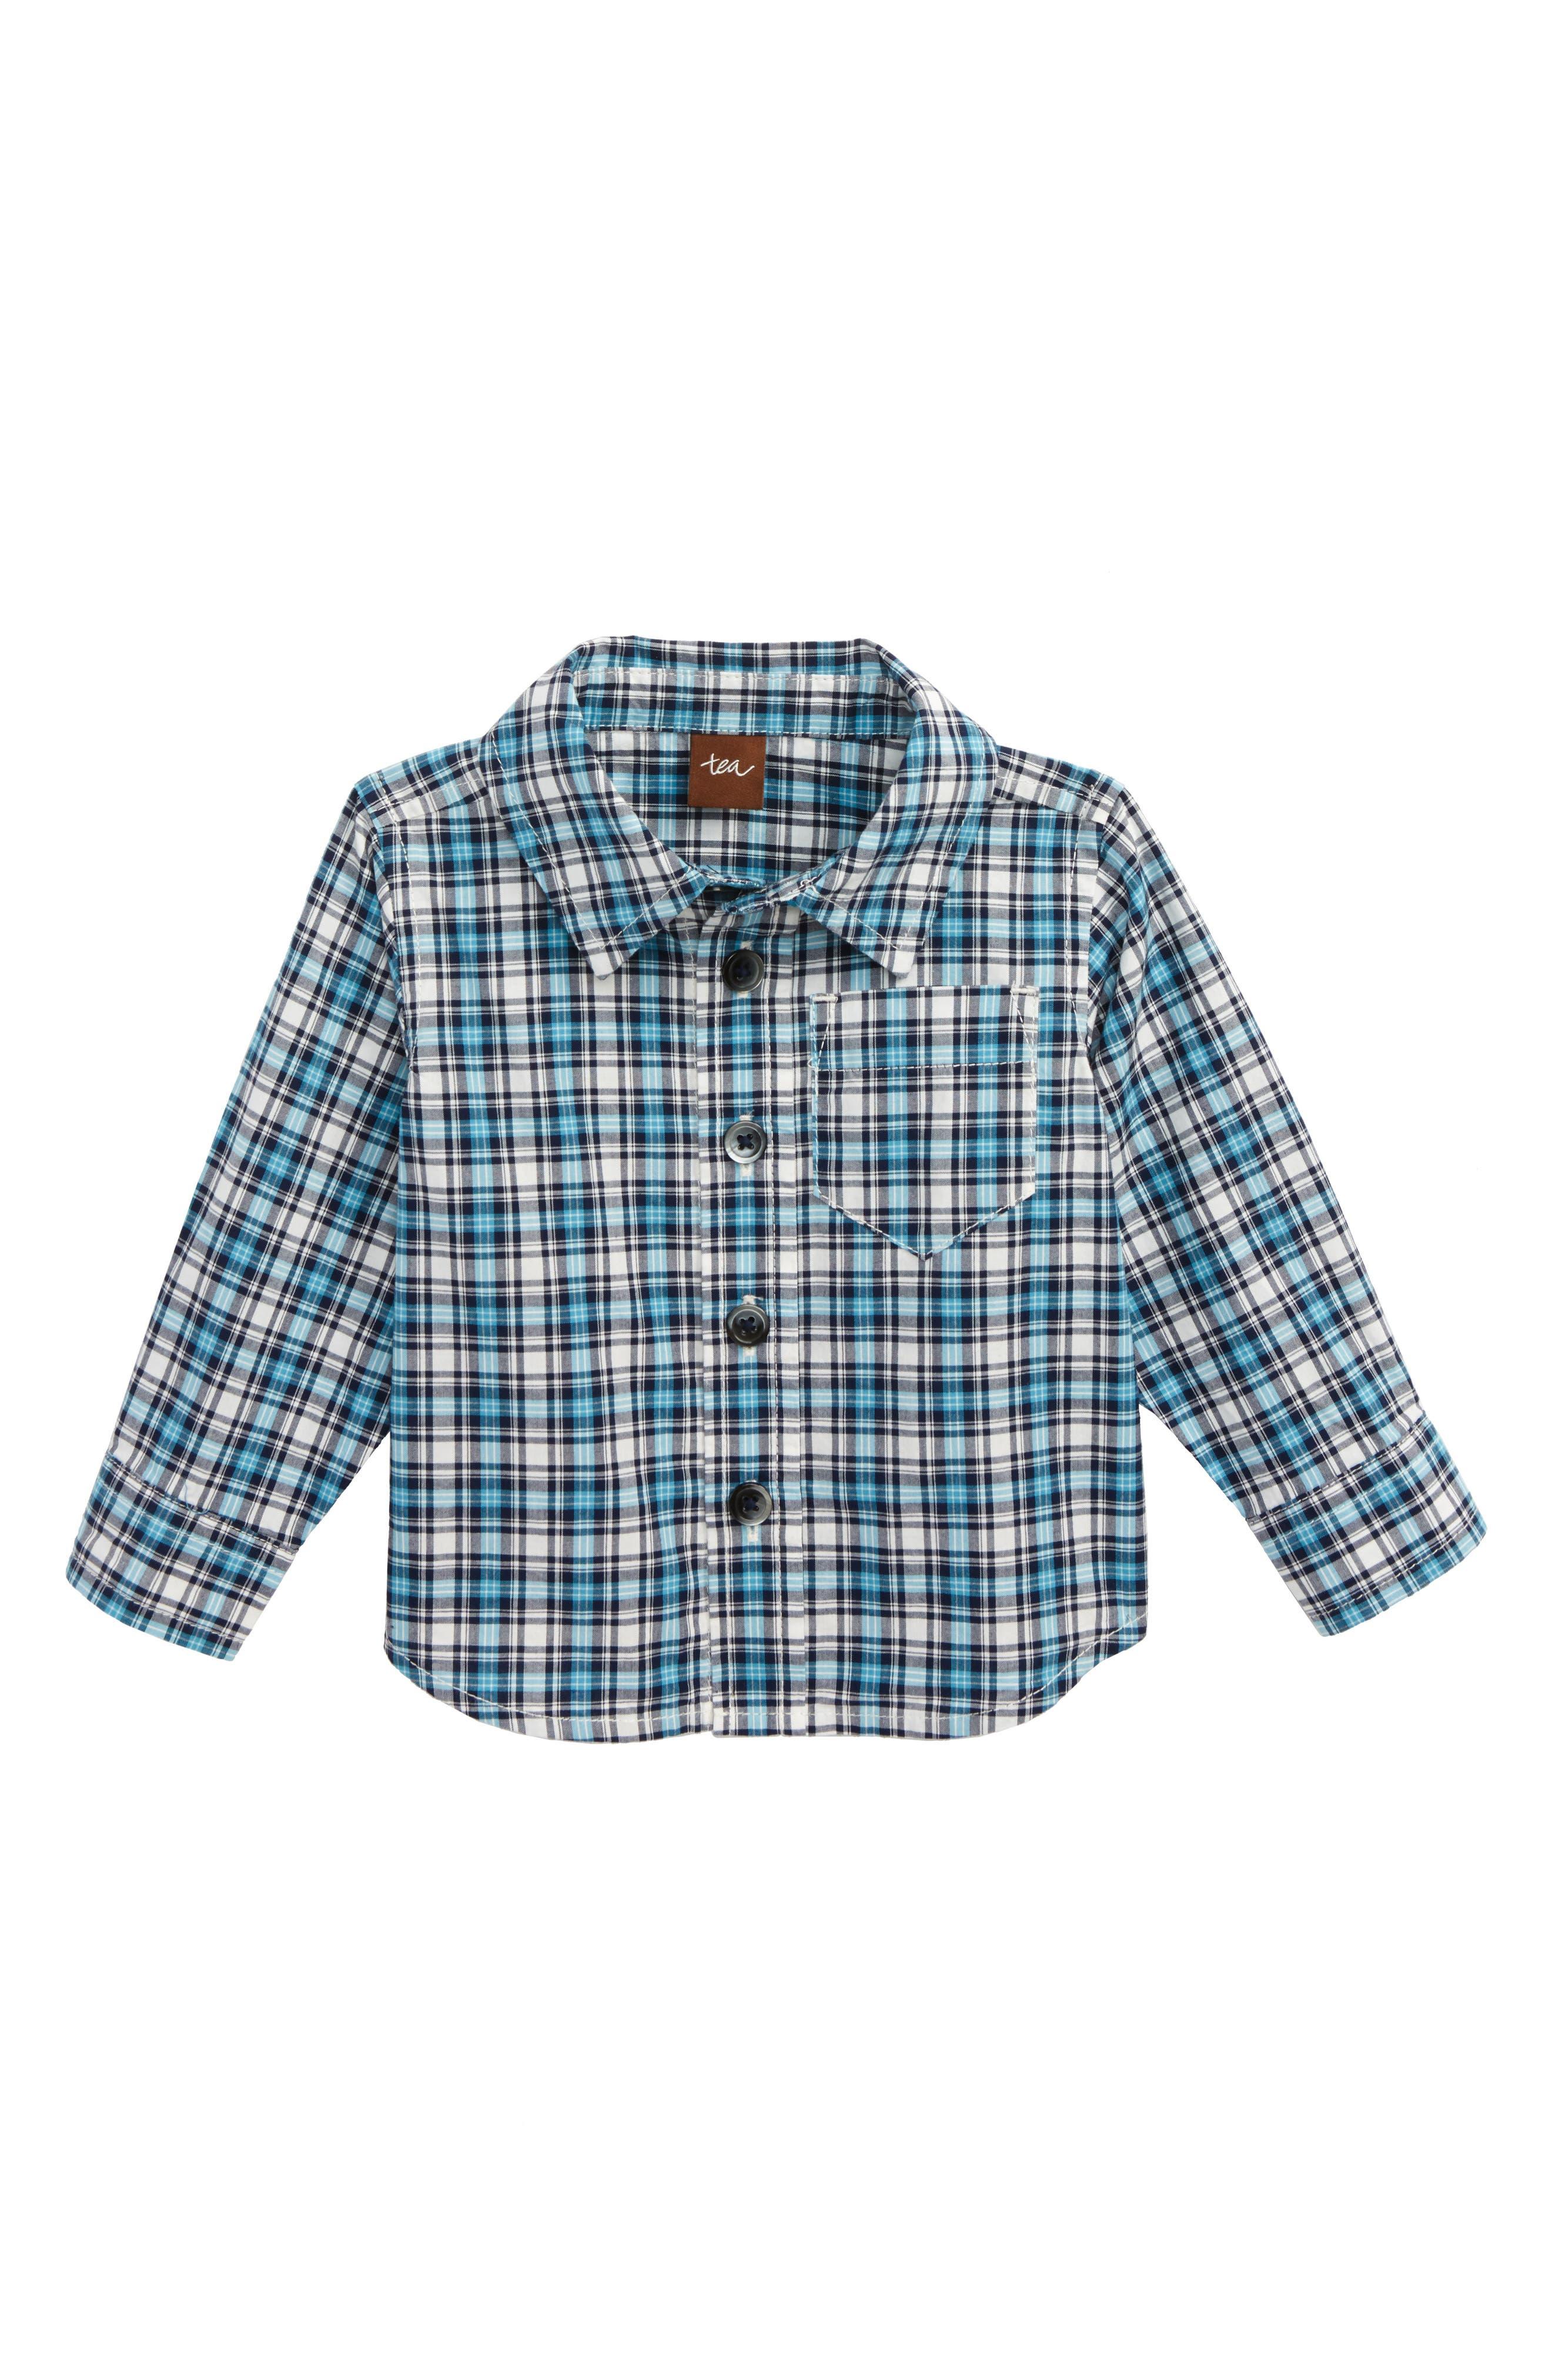 Heath Plaid Woven Shirt,                             Main thumbnail 1, color,                             400